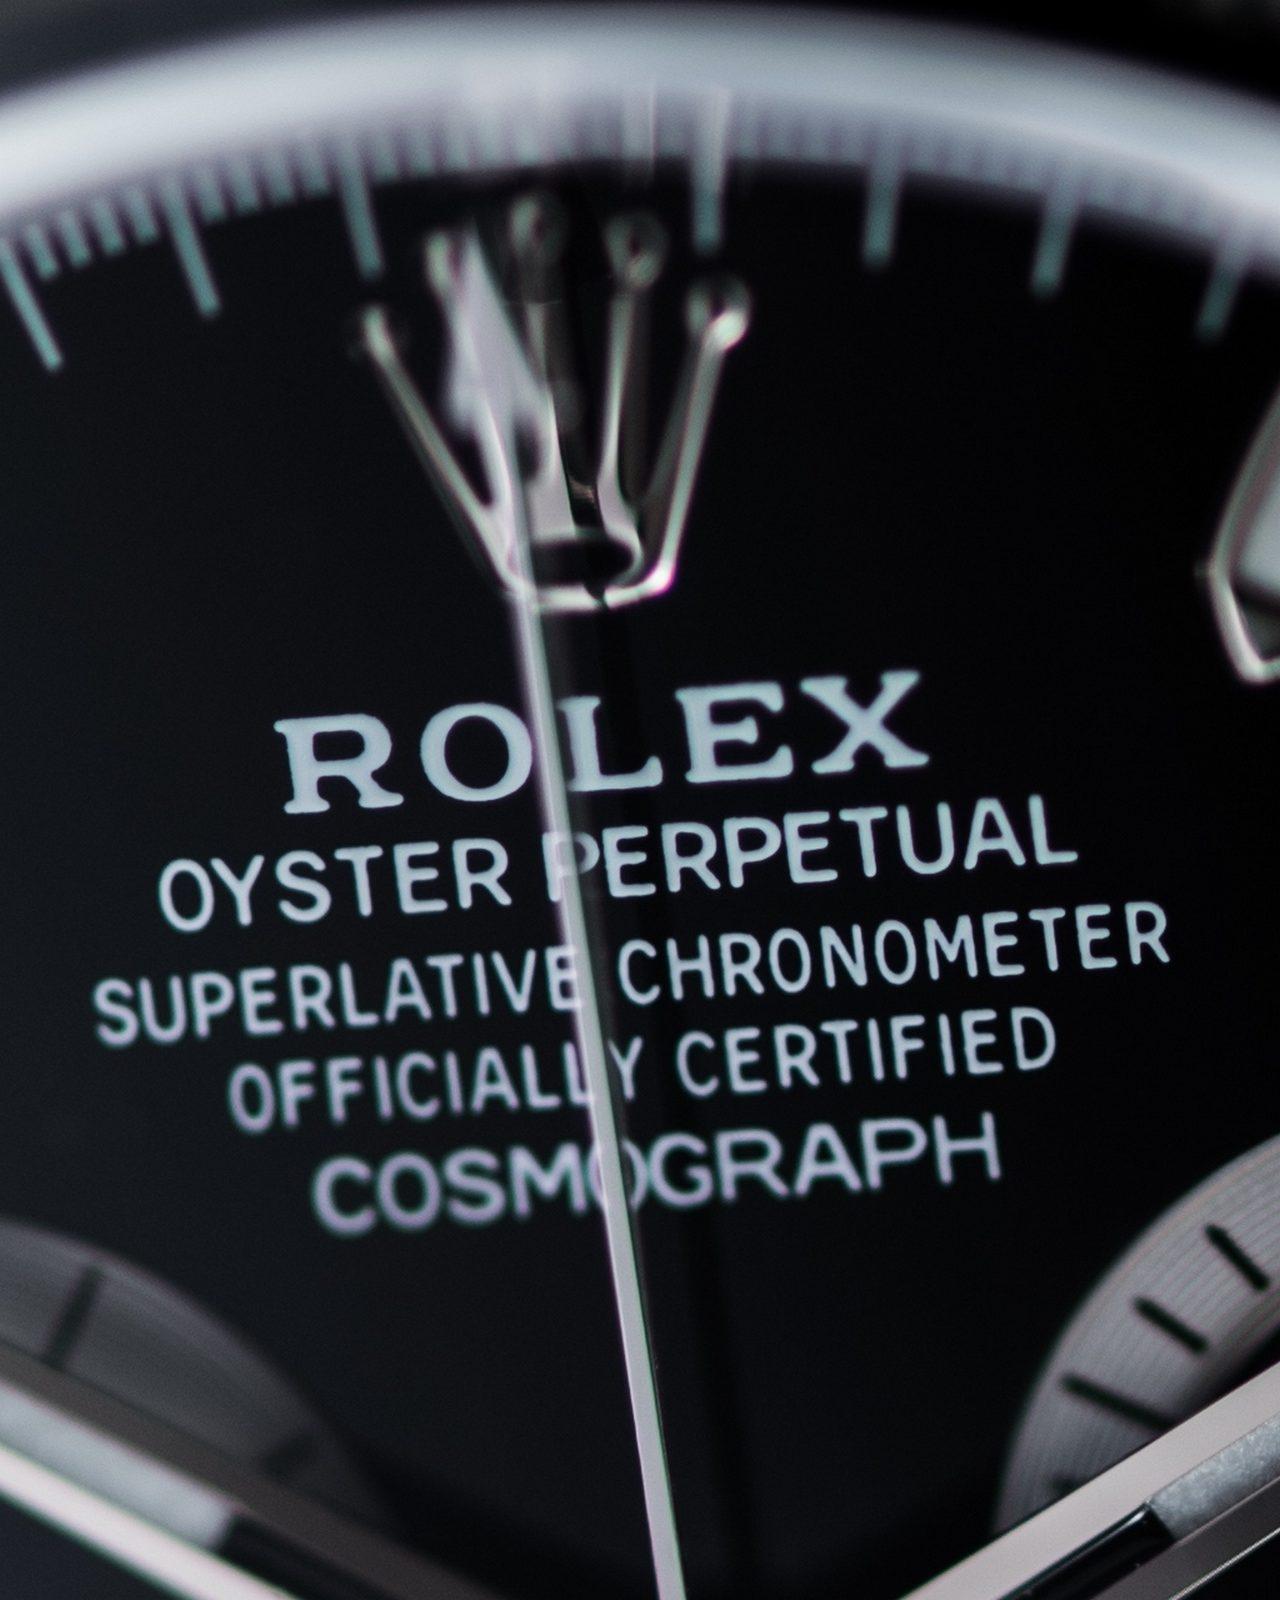 watch-test-rolex-daytona-116500ln-acciaio-con-lunetta-in-cerachrom-nera-prezzo-price_0-10022